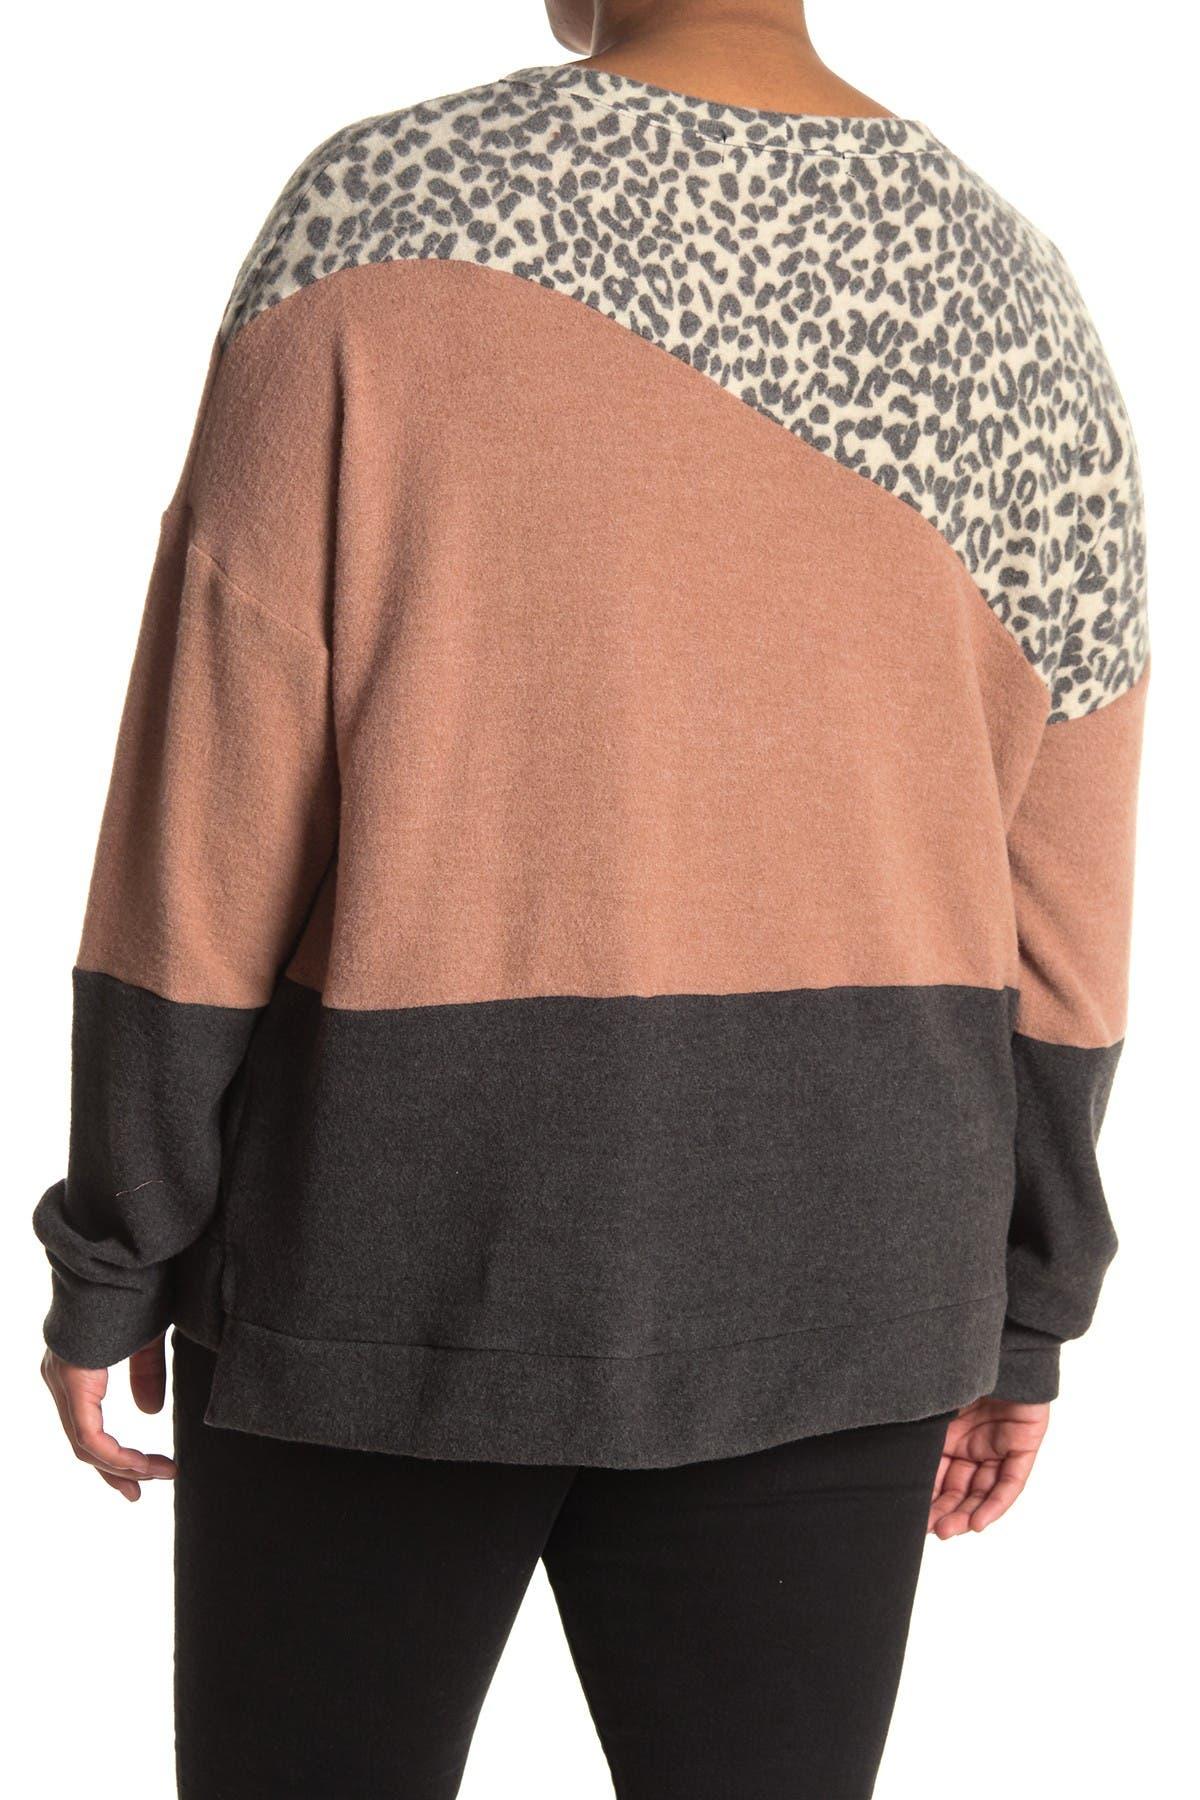 Image of SOCIALITE CURVE Colorblock Crew Neck Sweater